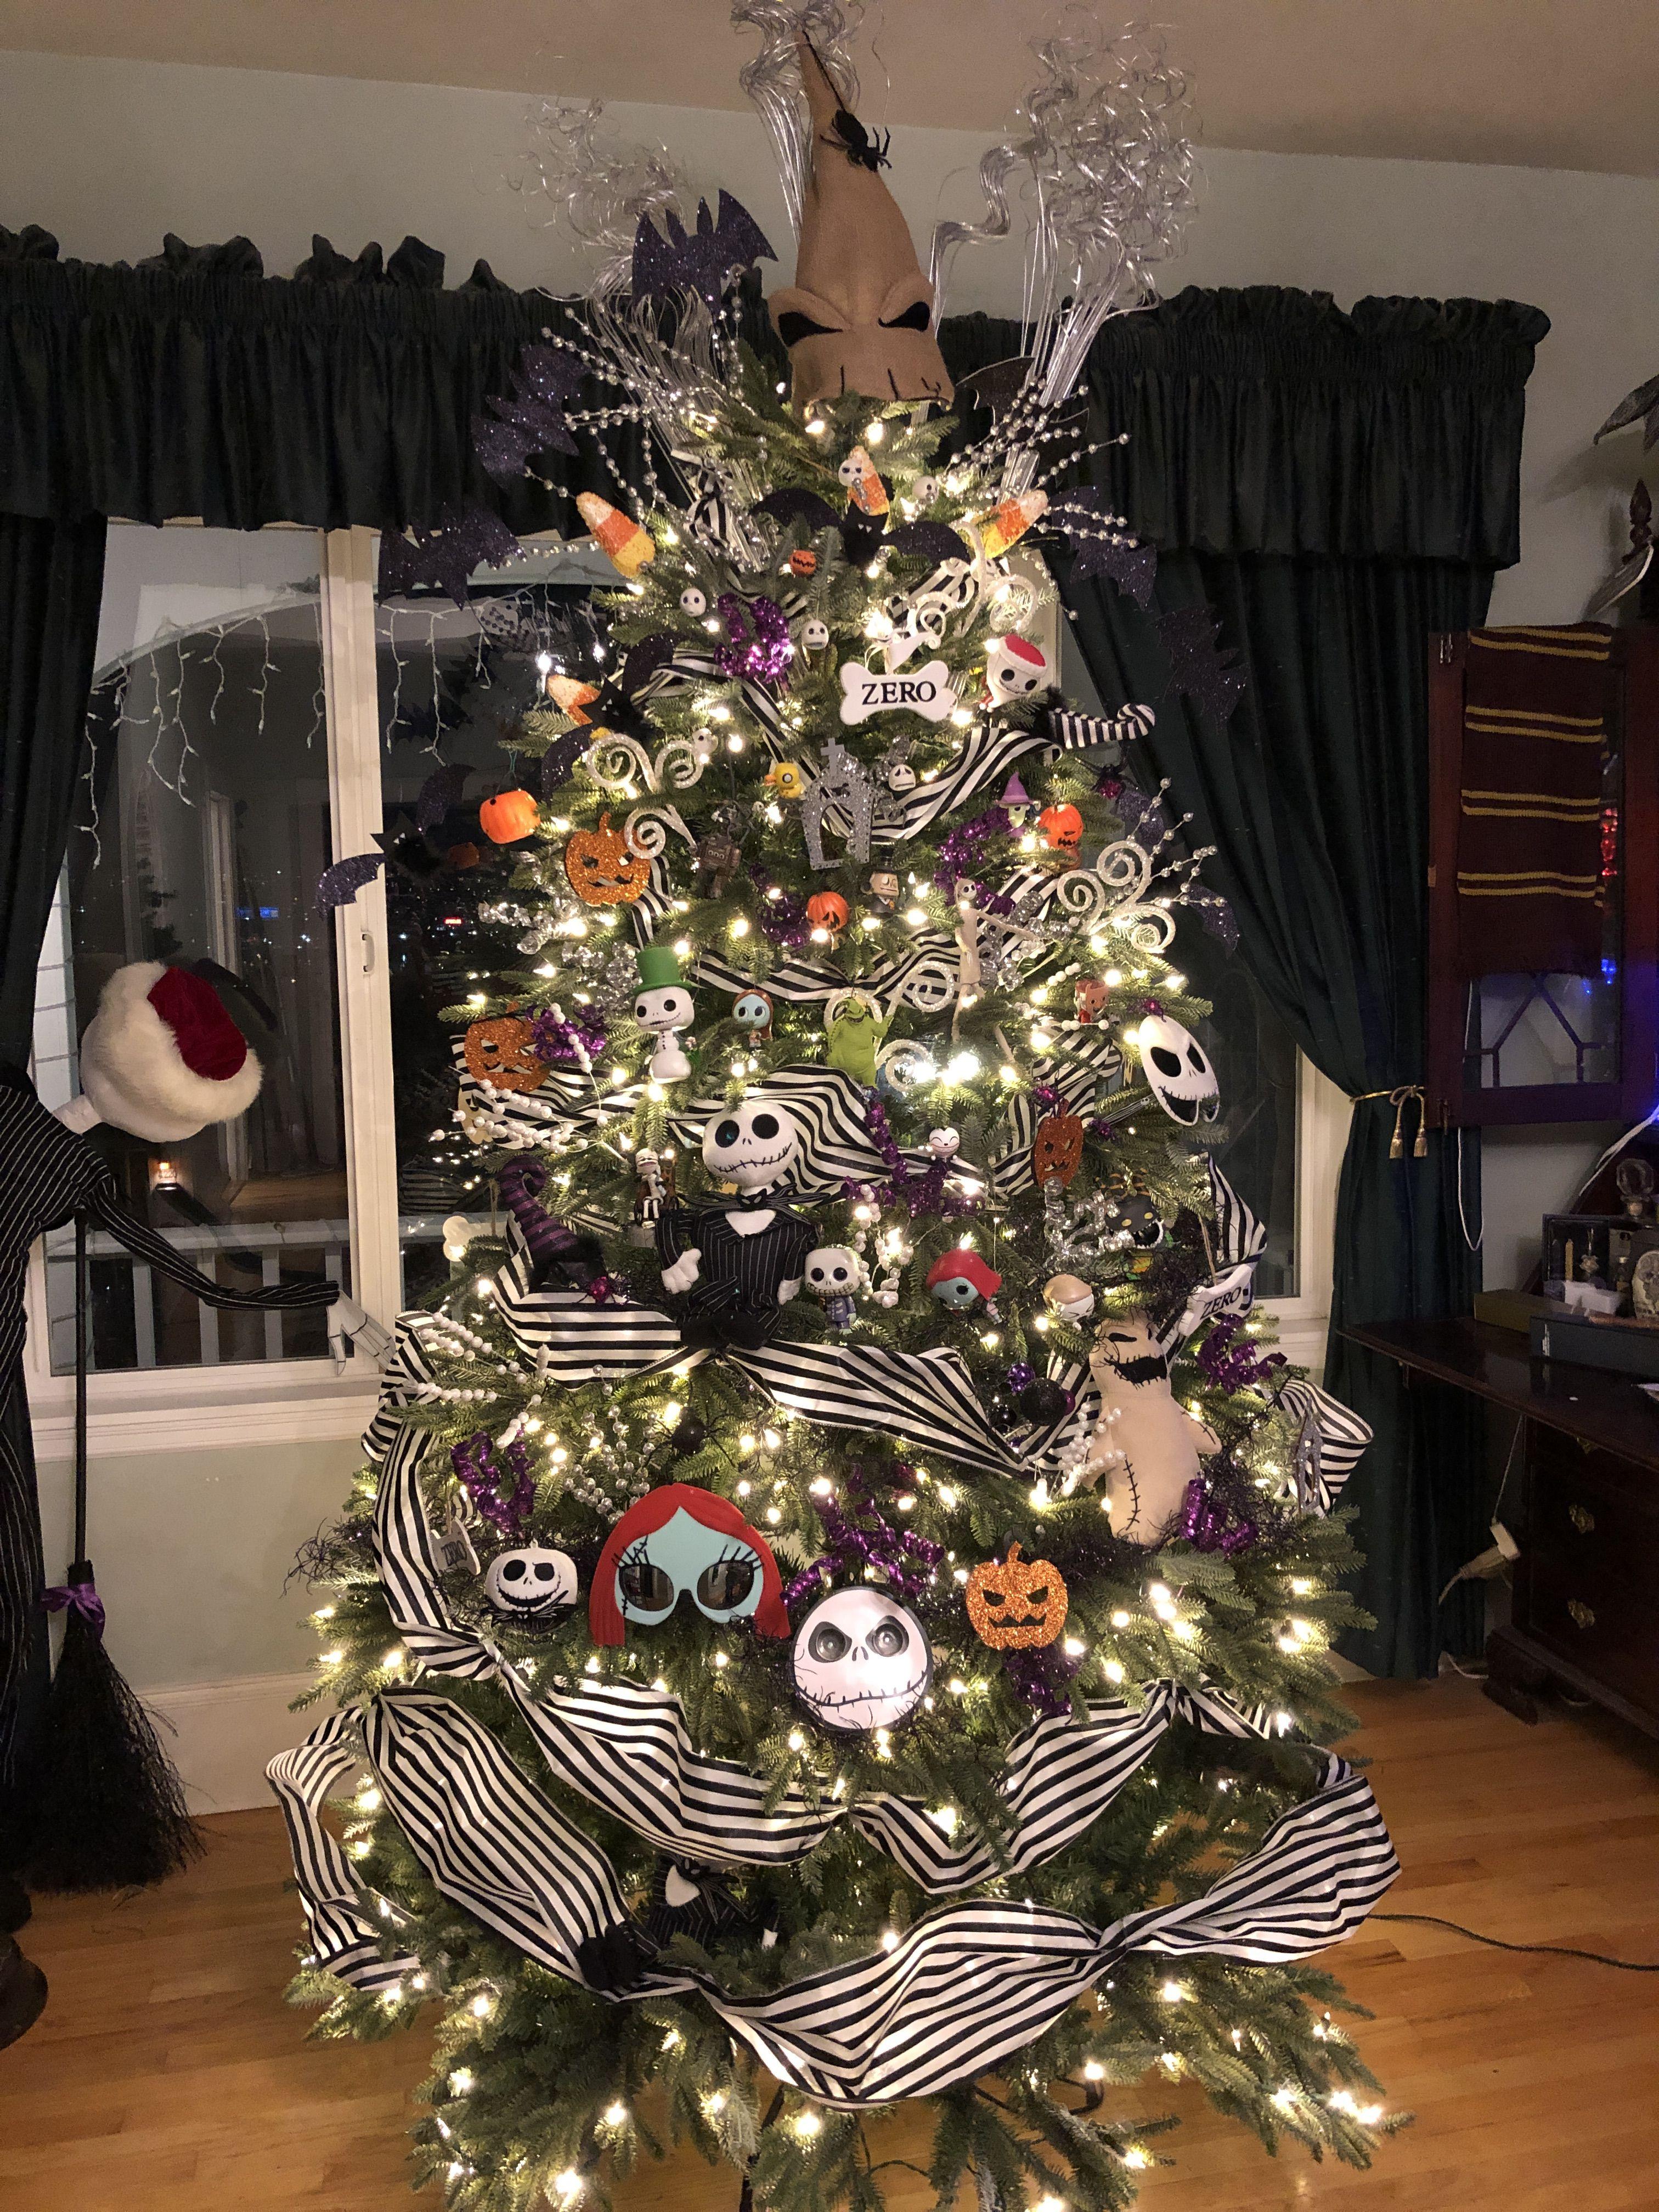 Our Nightmare Before Christmas Tree Nightmare Before Christmas Decorations Nightmare Before Christmas Ornaments Halloween Christmas Tree